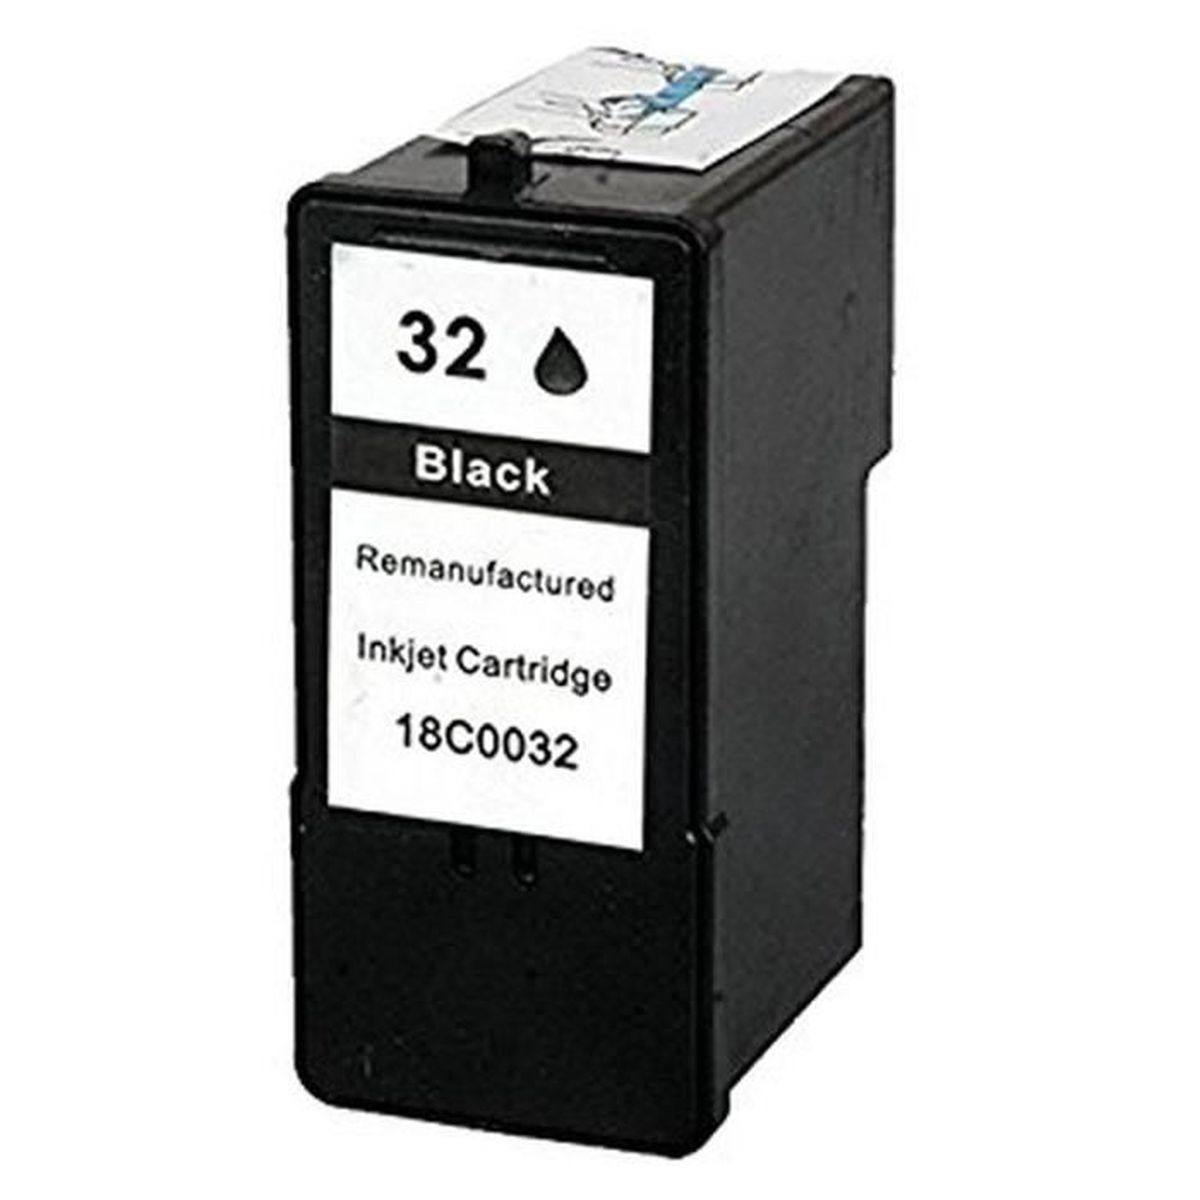 pilote imprimante lexmark x3350